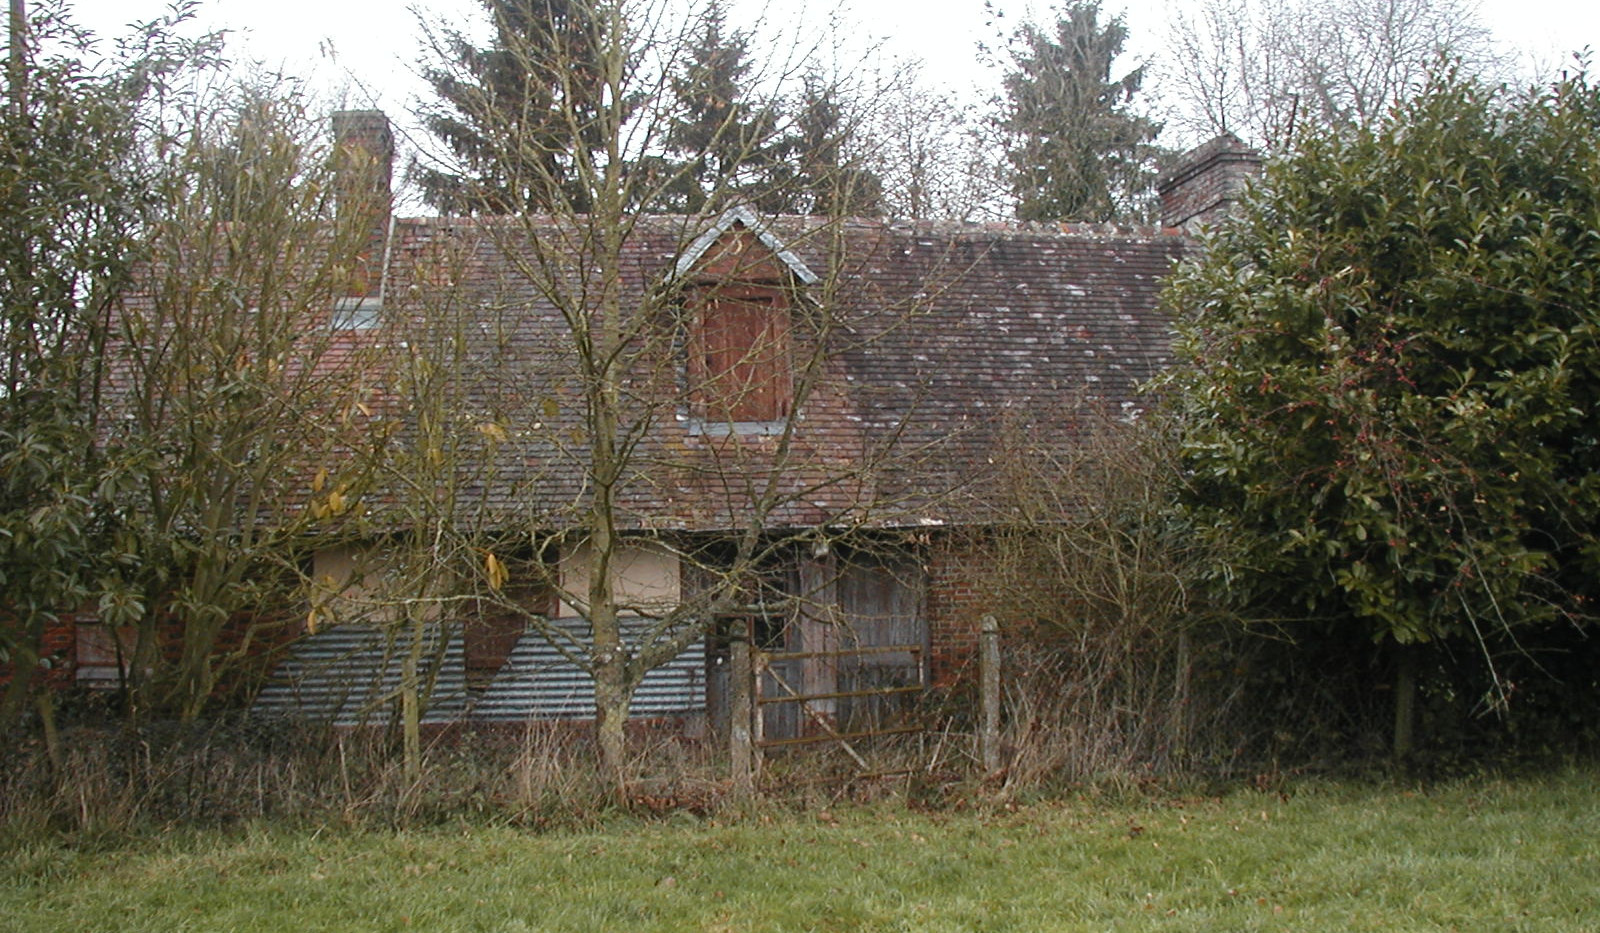 Maison du Garde